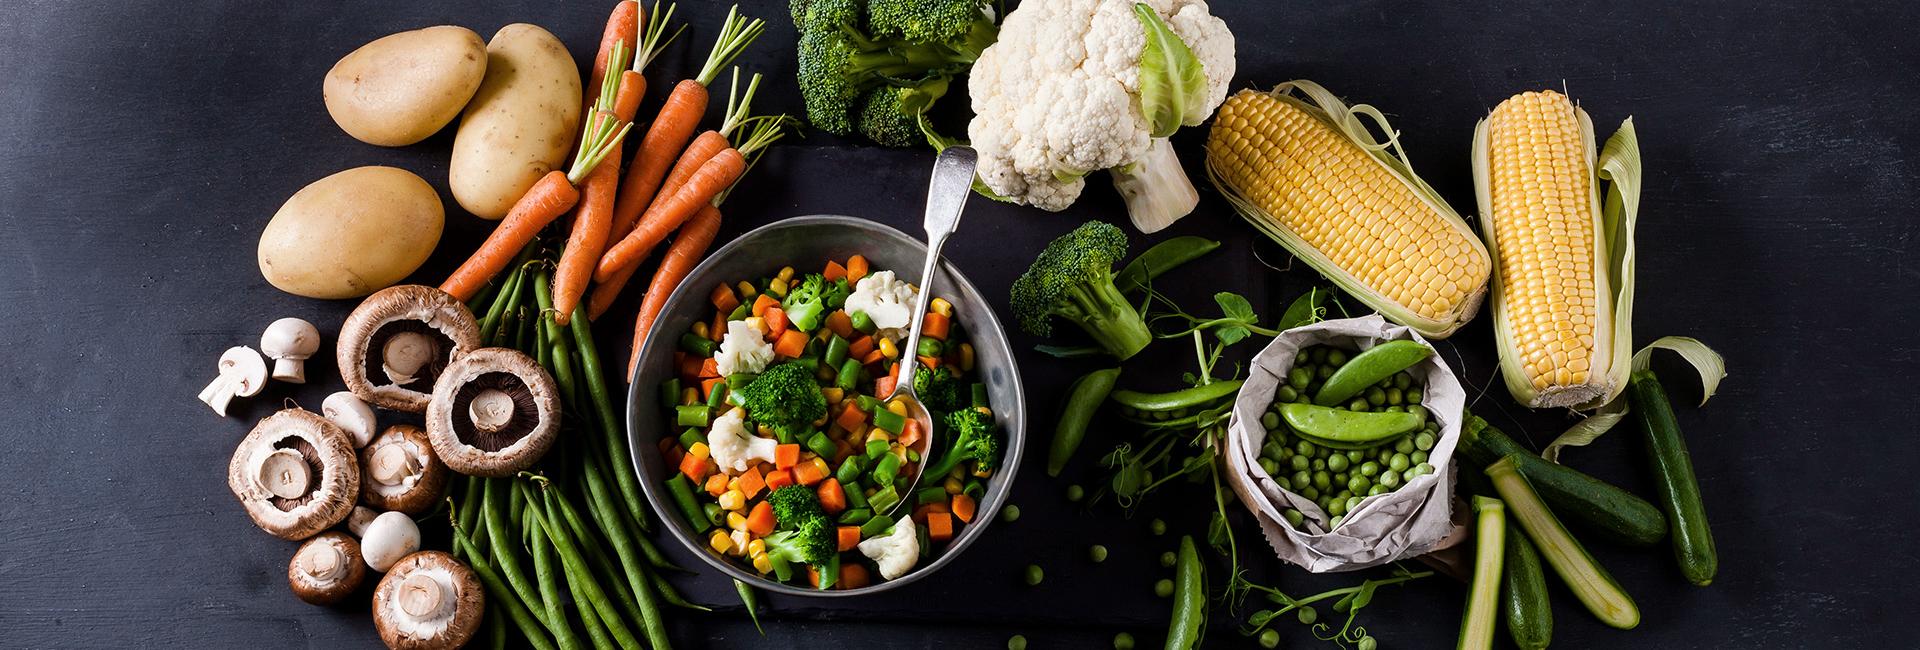 Antioxidants & Wholesale Frozen Vegetables